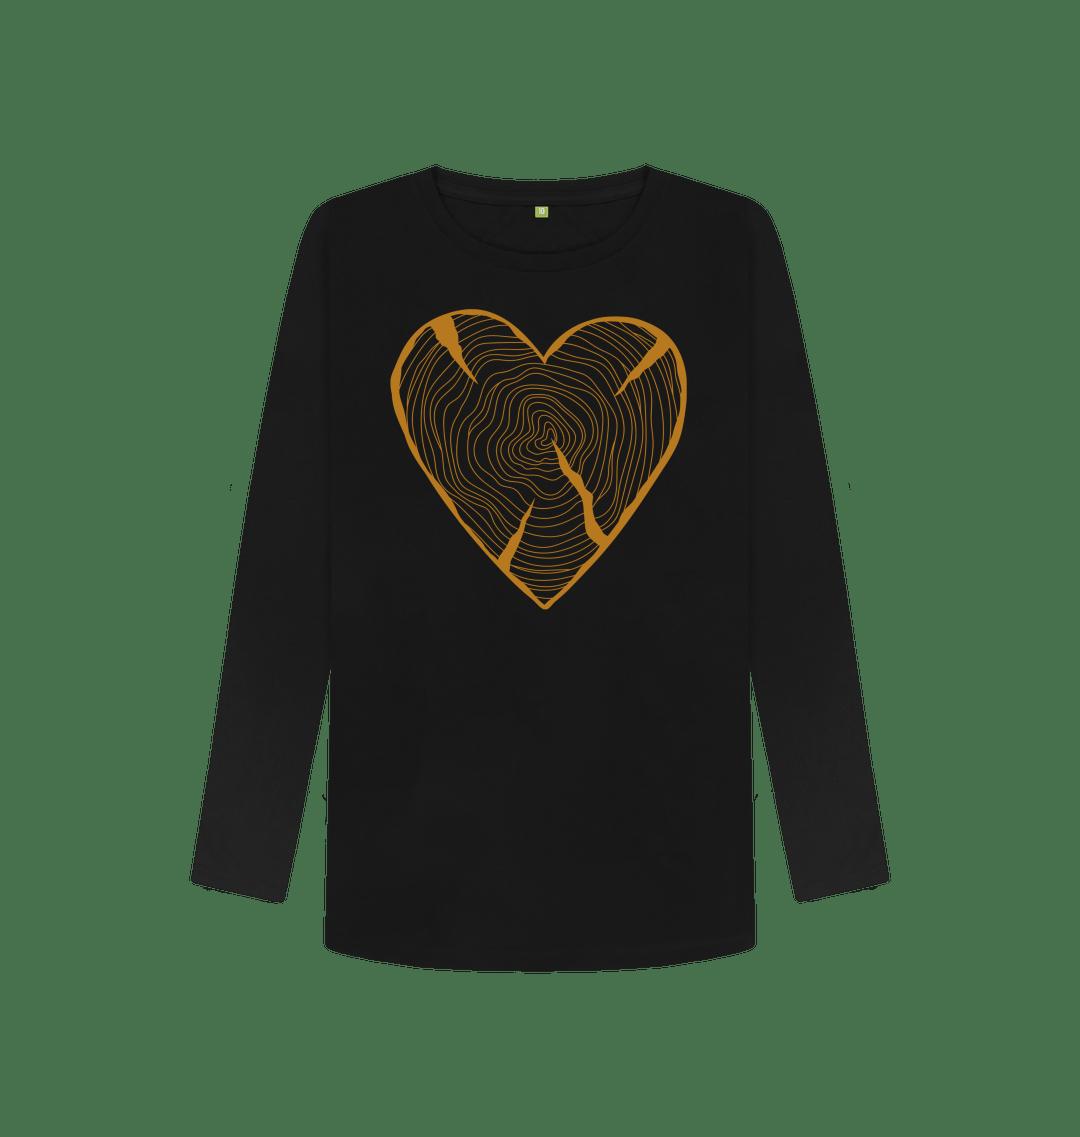 Women's Nature Lovers Adventure Heart Tree Trunk Rings Long Sleeved Top – Organic Cotton, Vegan Kind Shop 5